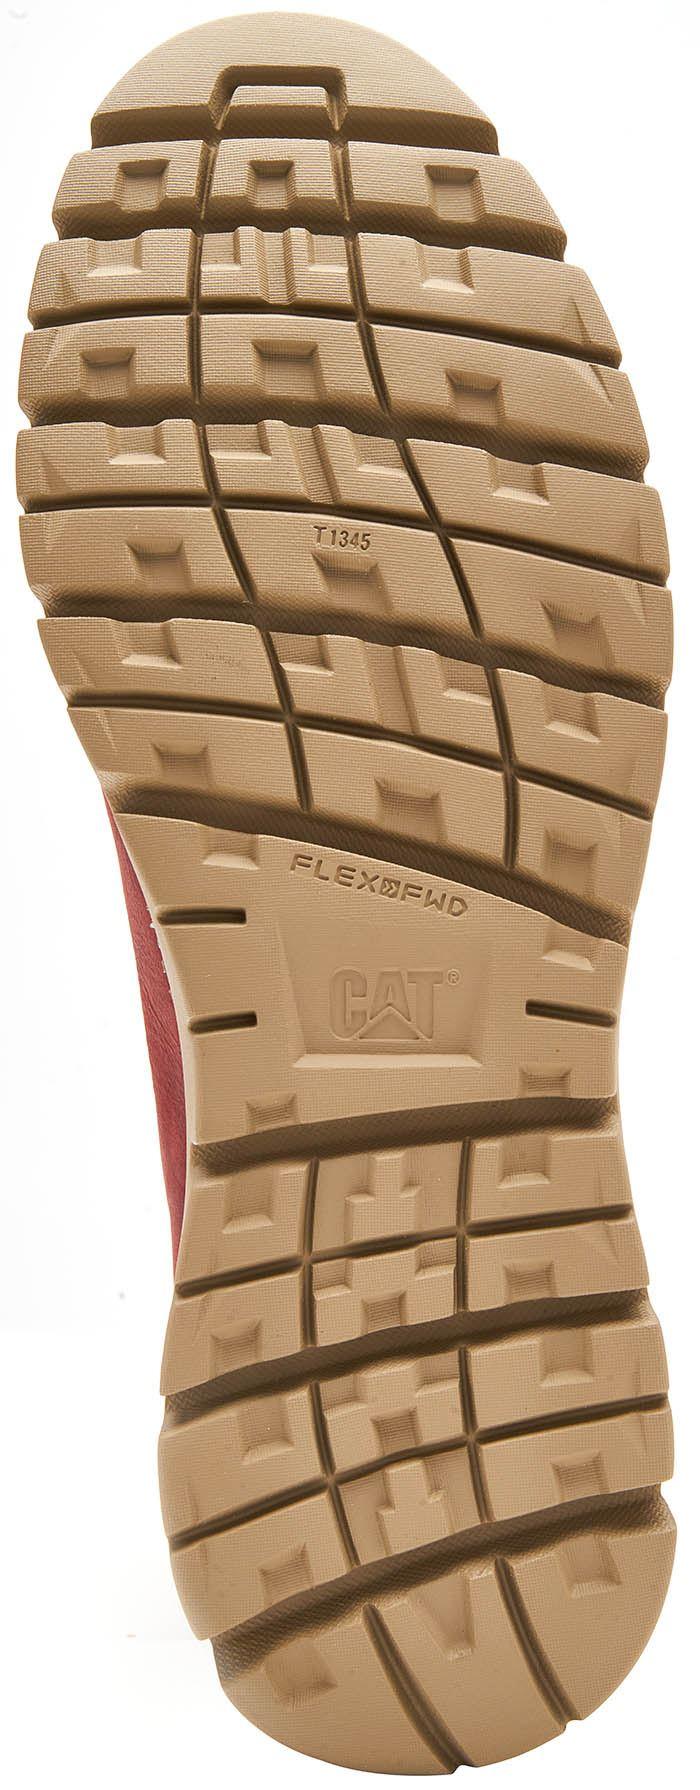 Caterpillar-CAT-Mitcham-Leather-Boots-in-Bronze-Brown-amp-Dark-Red thumbnail 9